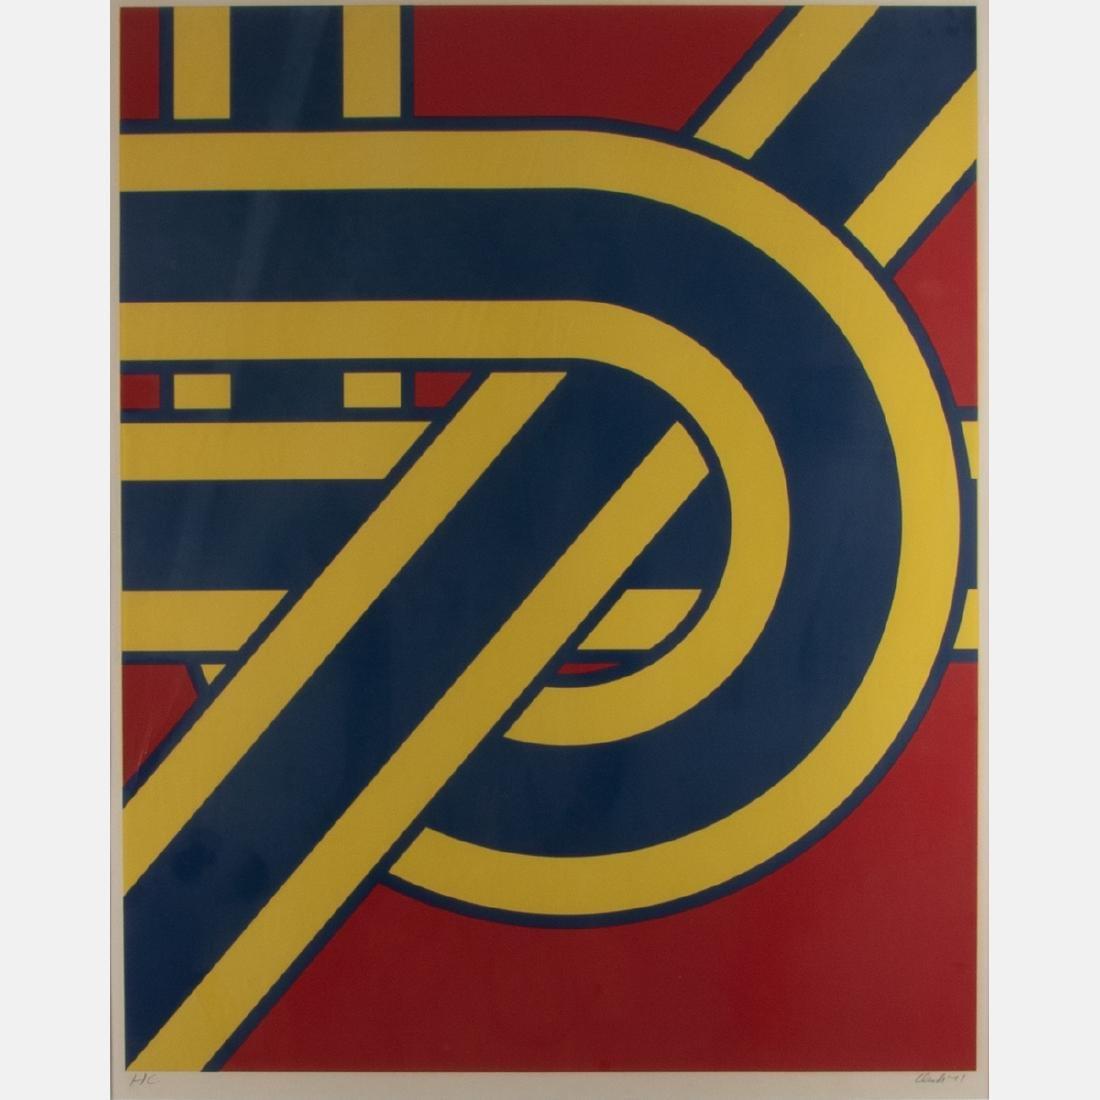 Pierre Clerk (b.1928) Untitled #3, 1971, Serigraph, - 2